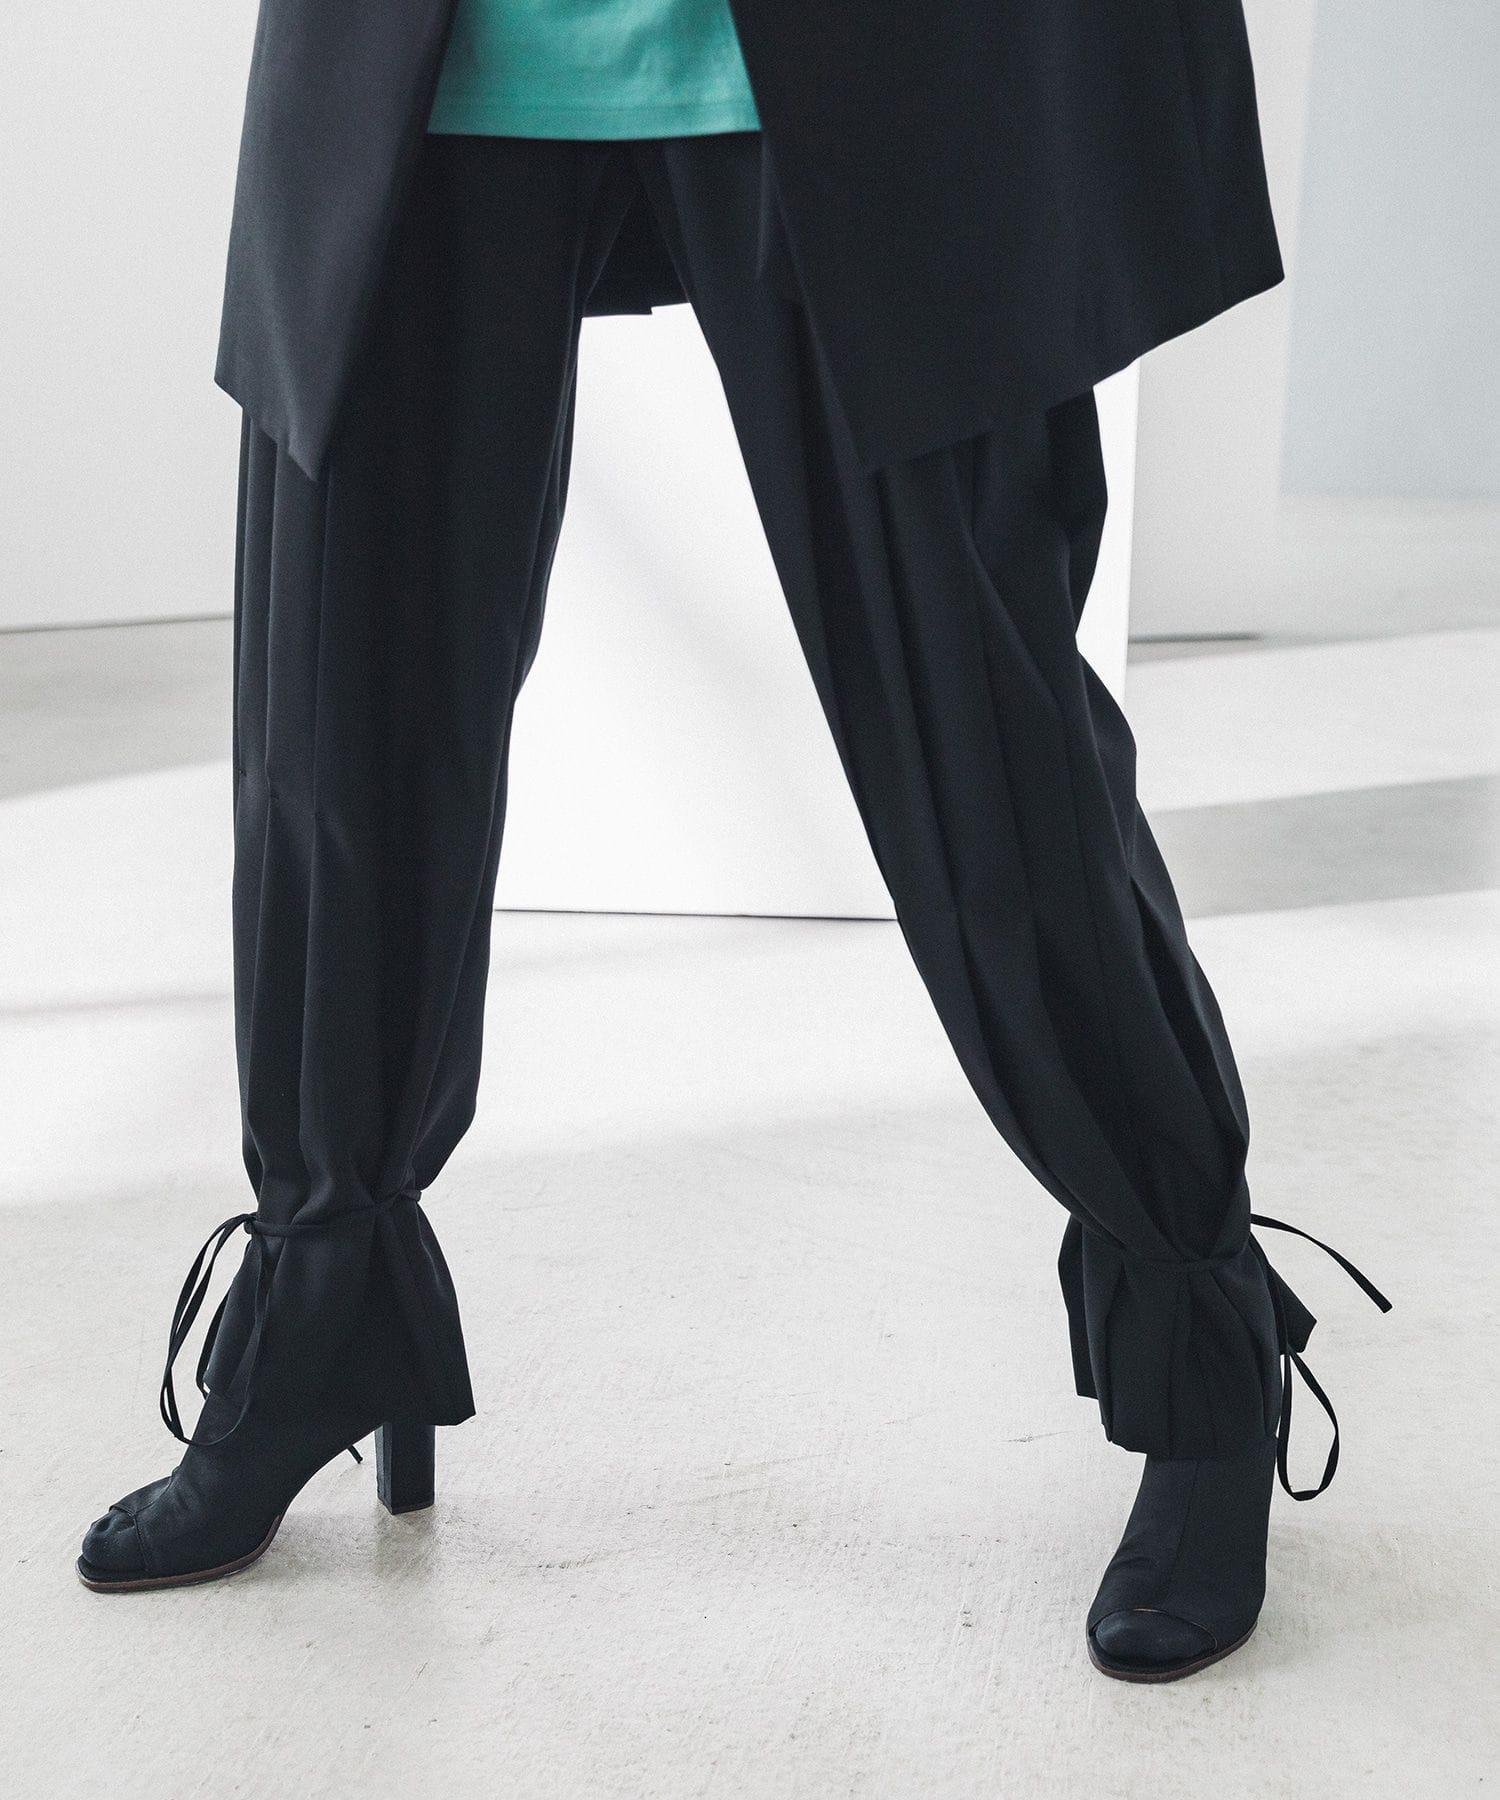 JET BLACK PLEATS BELTED PANTS